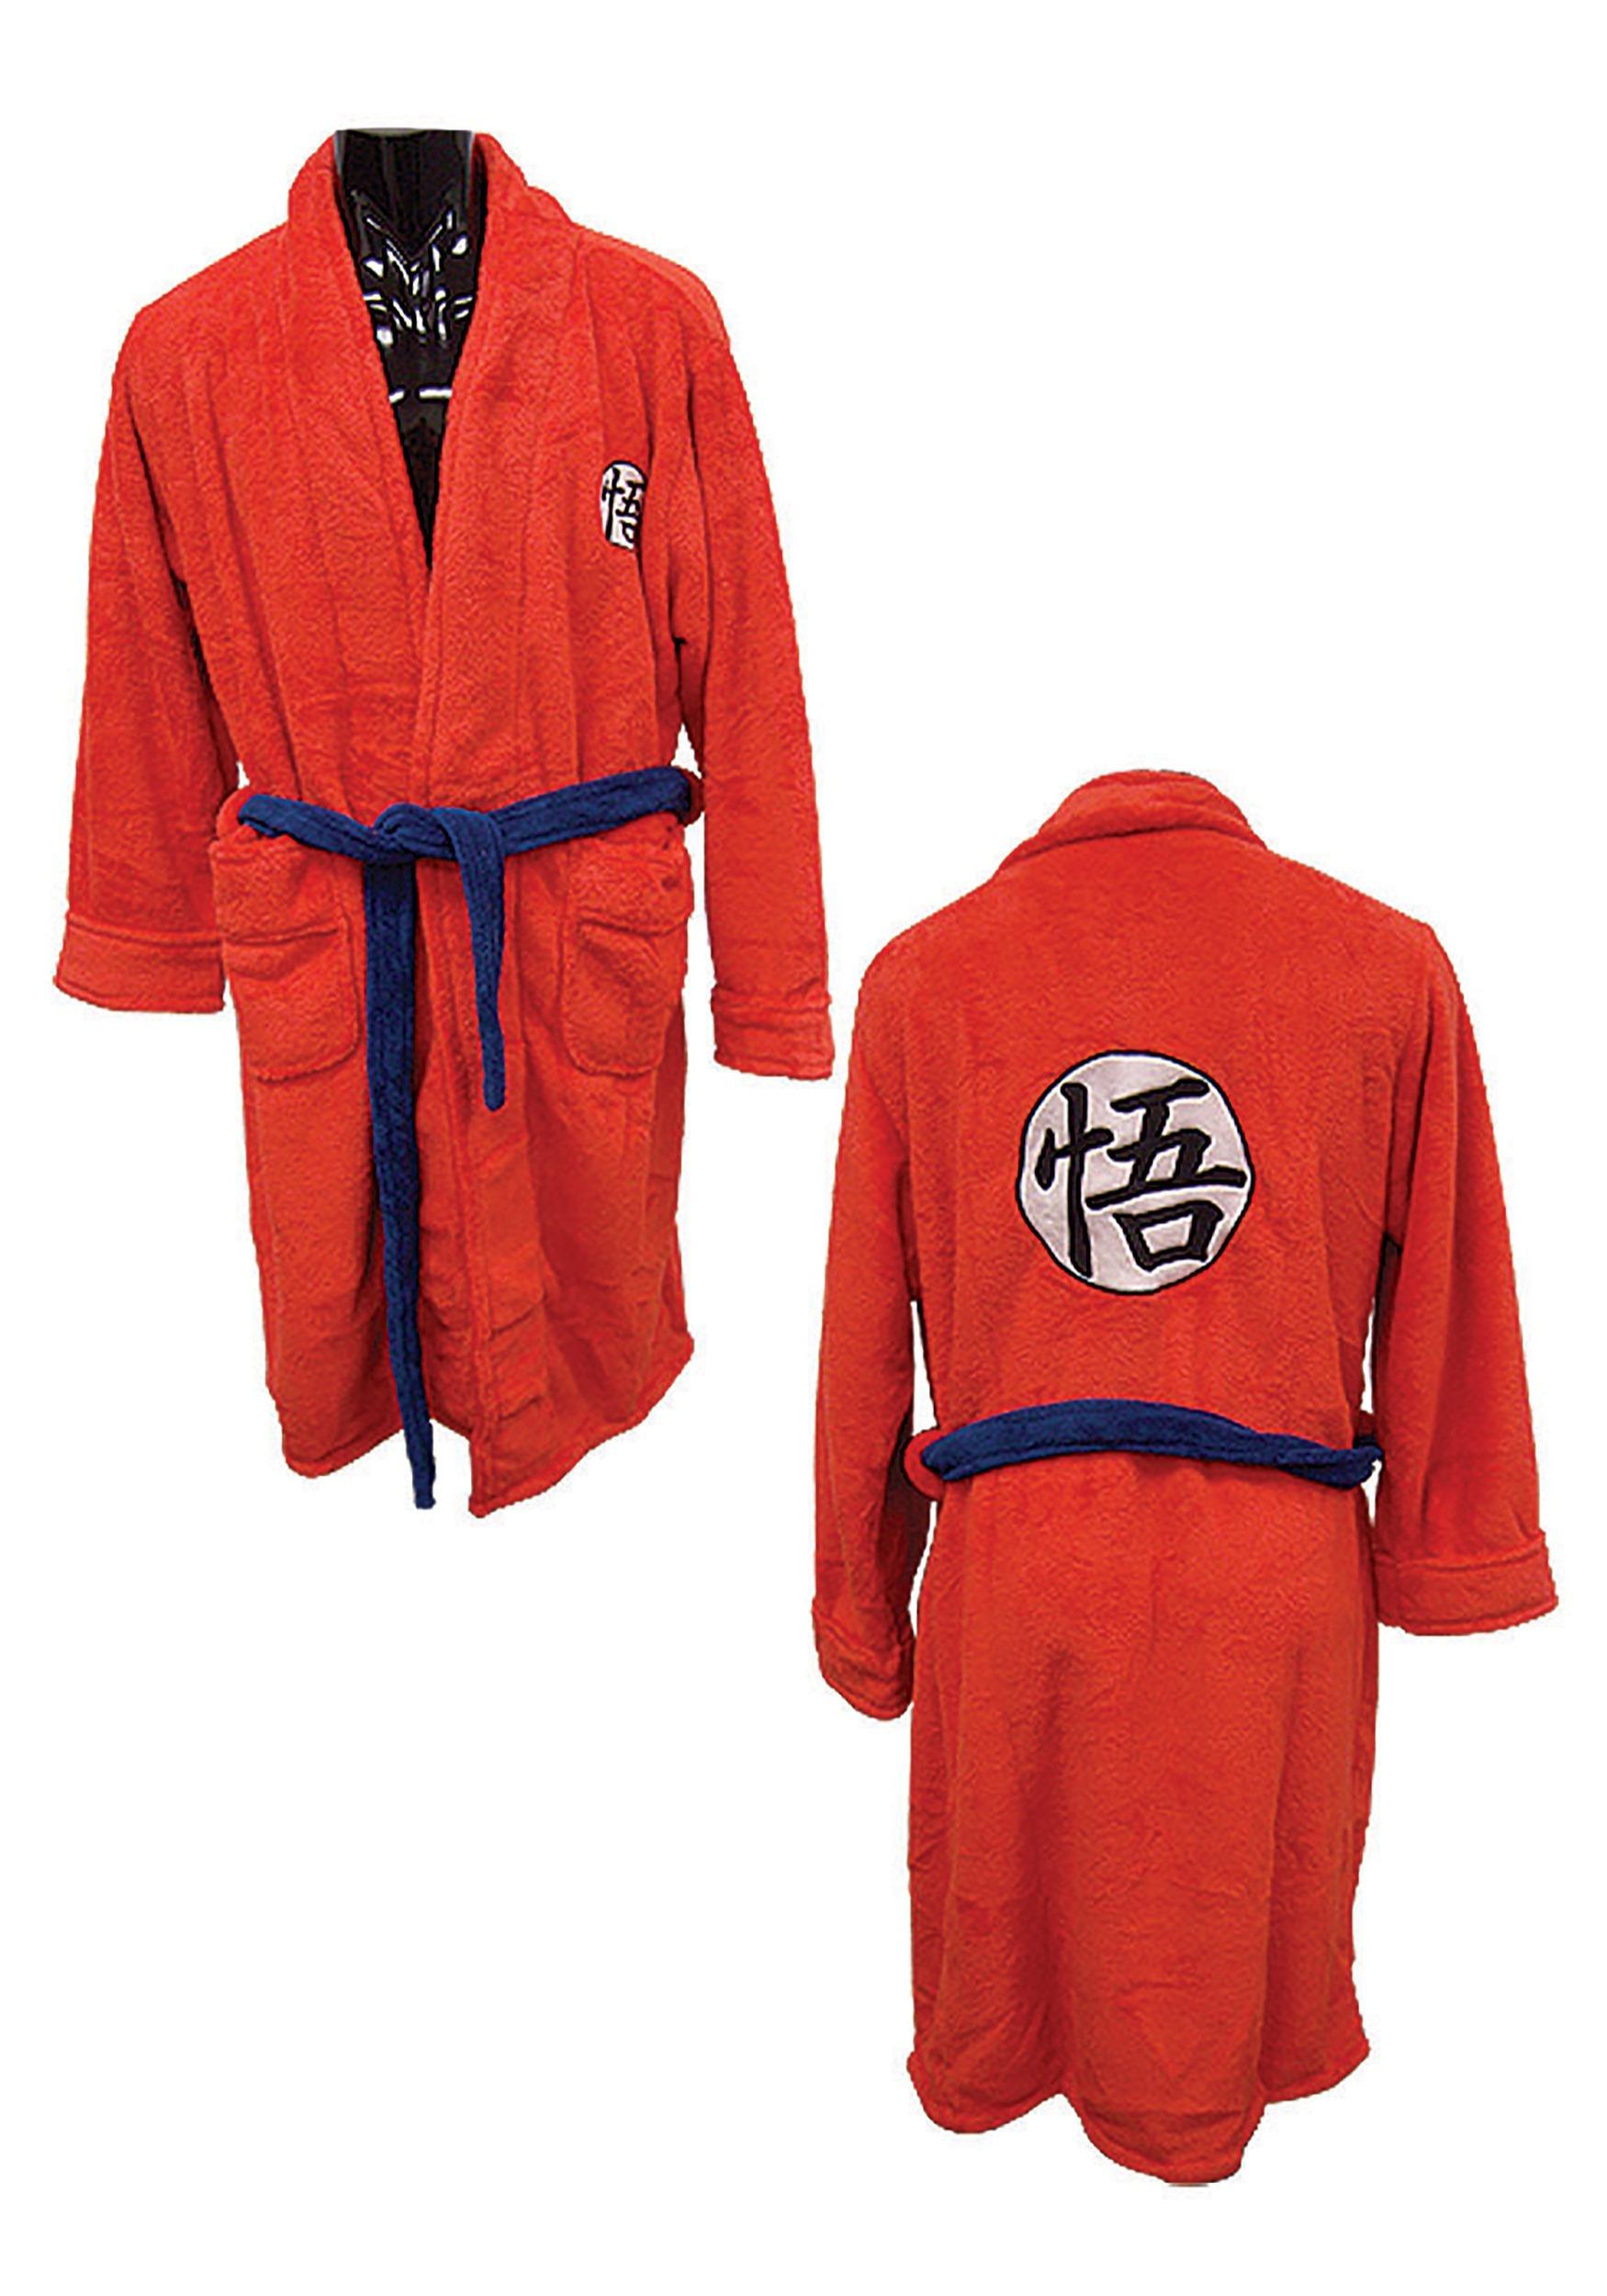 Items For Home Decoration Dragon Ball Z Goku Bath Robe